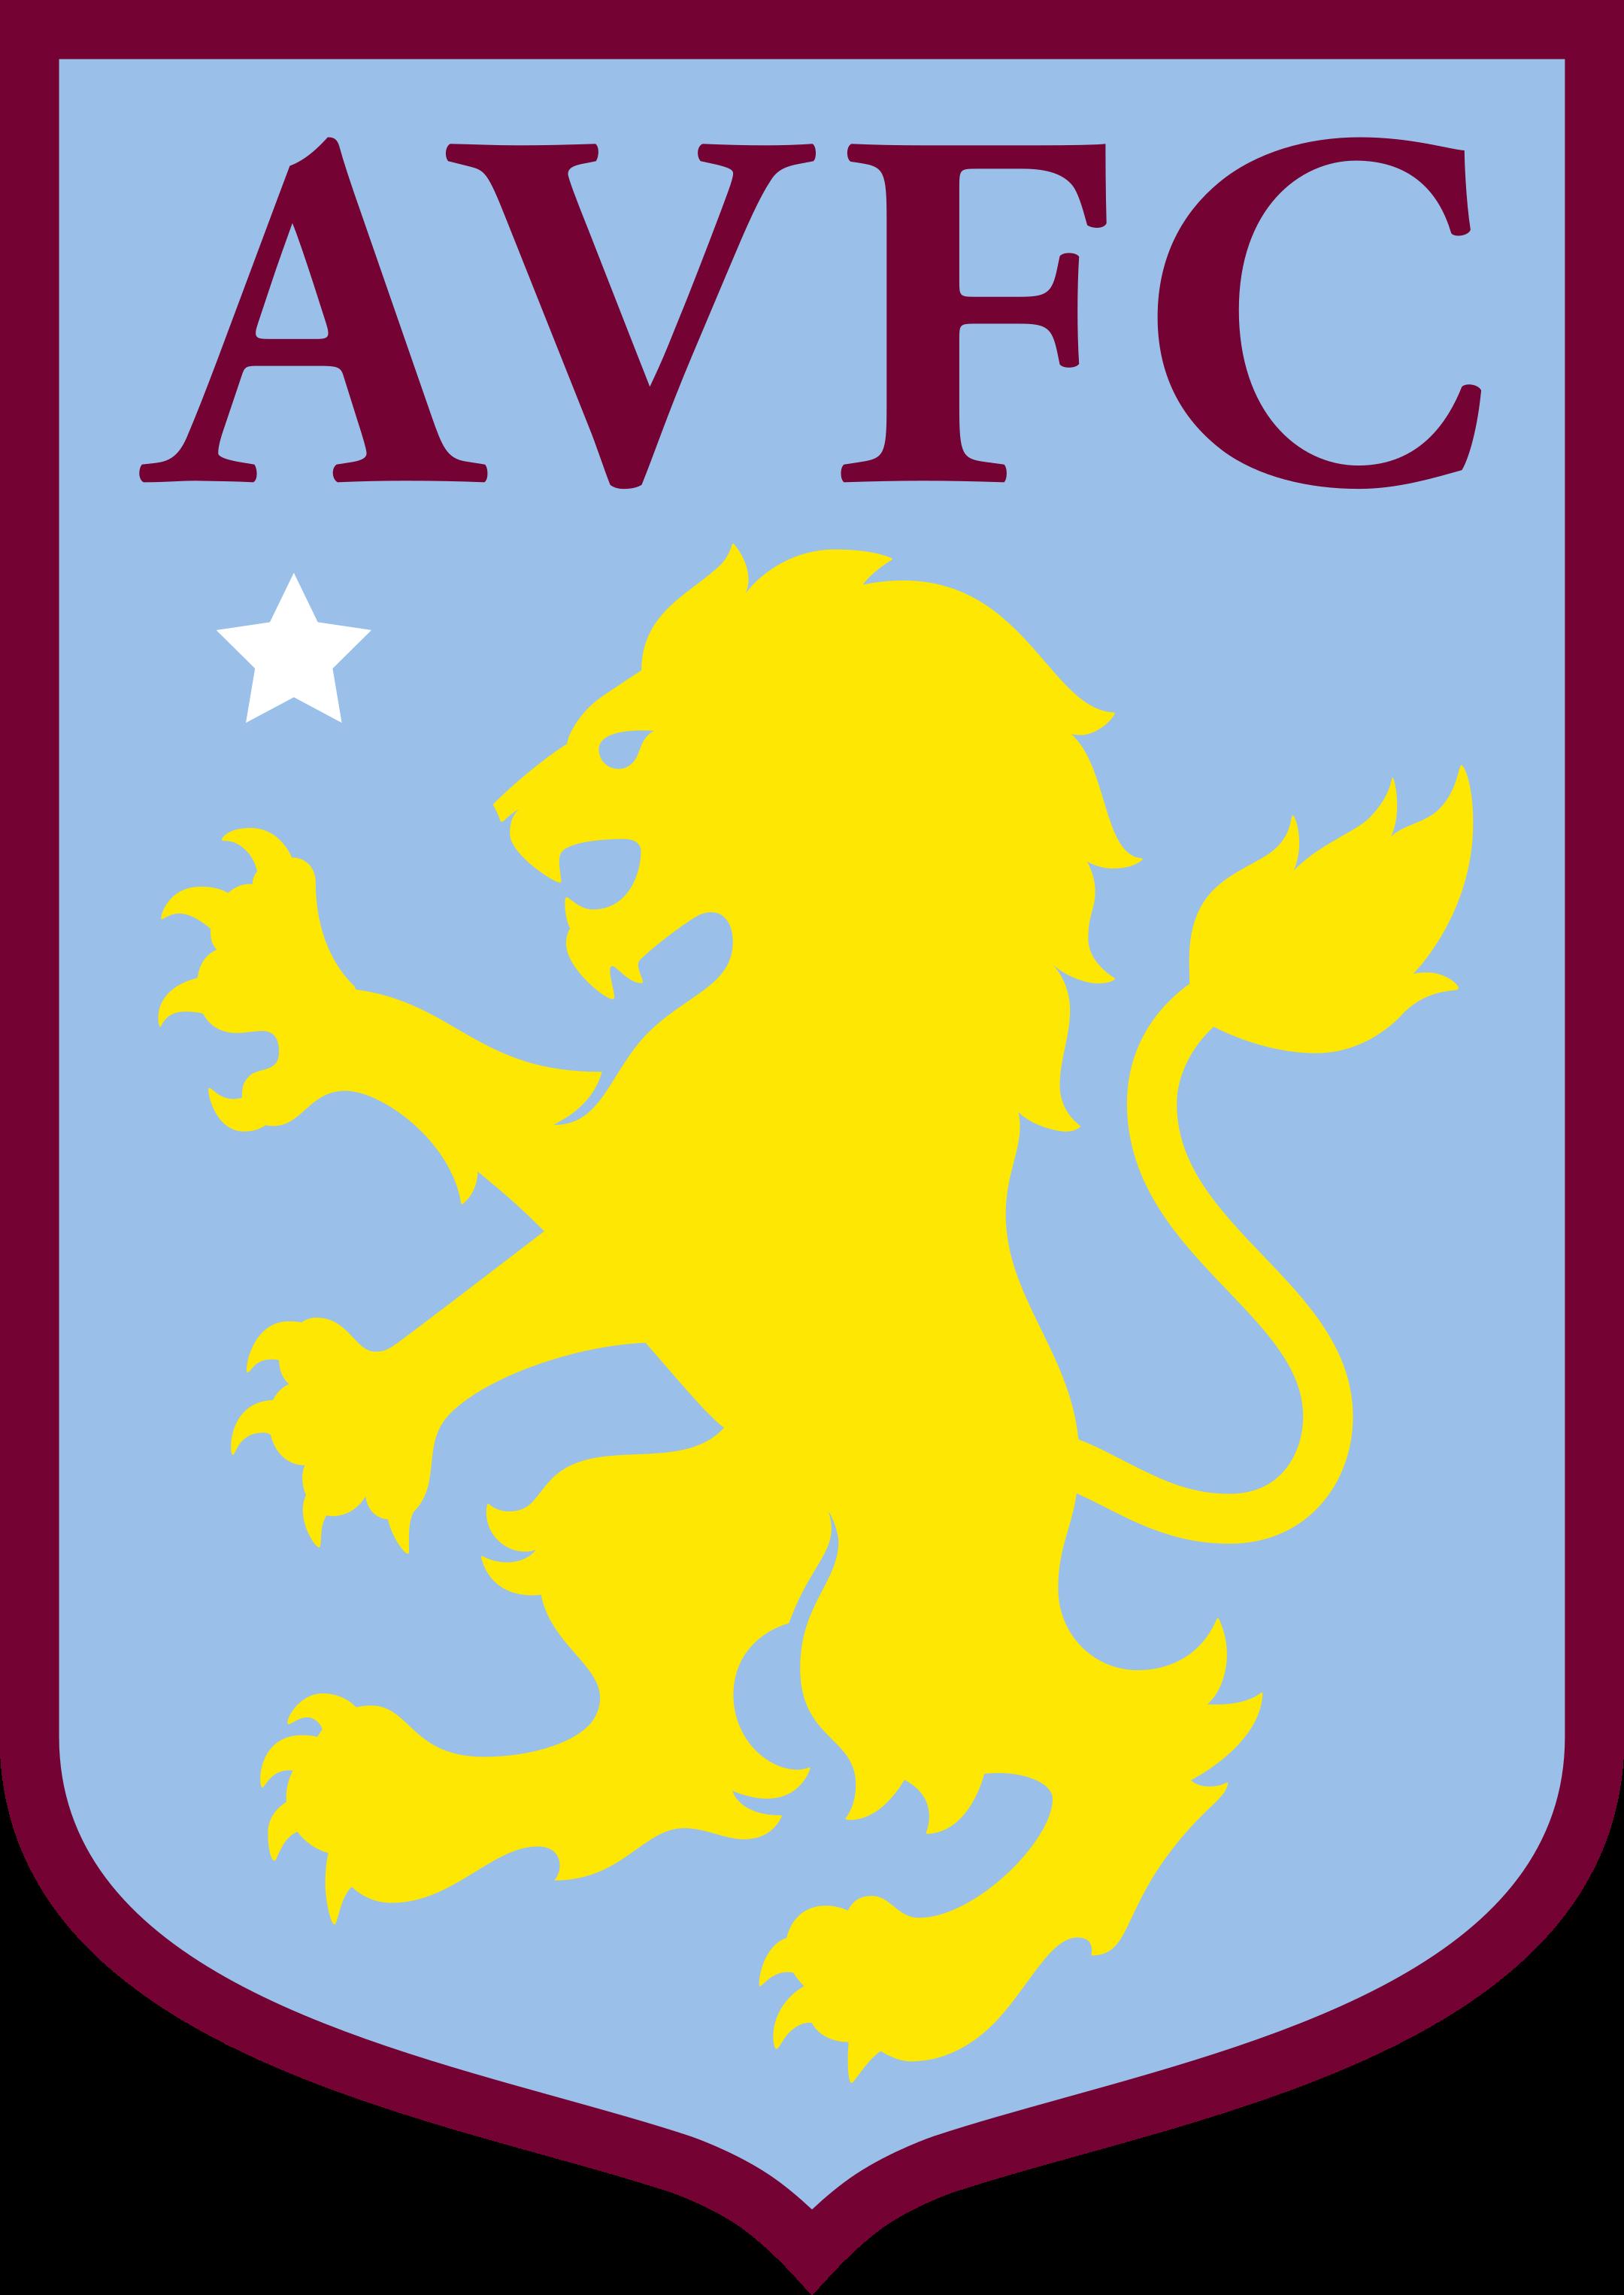 aston villa logo 1 - Aston Villa FC Logo